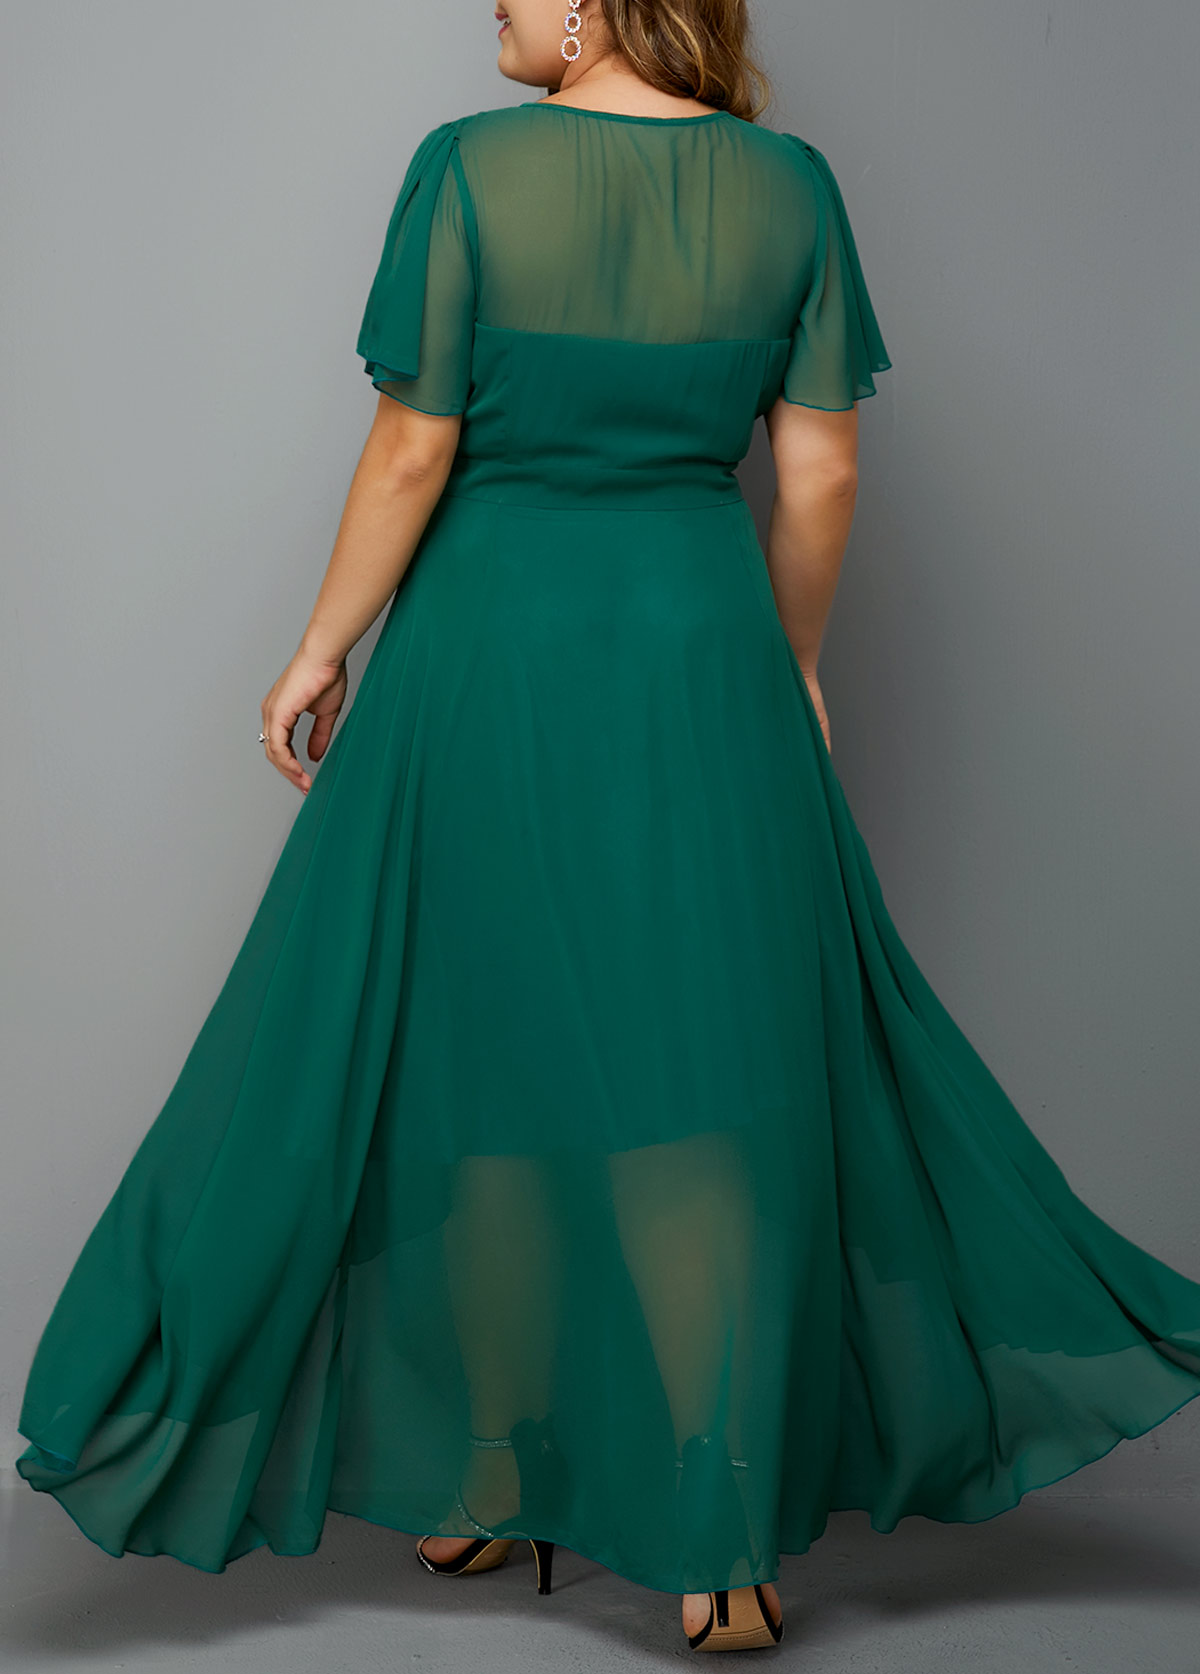 High Waist Side Zipper Plus Size Chiffon Dress